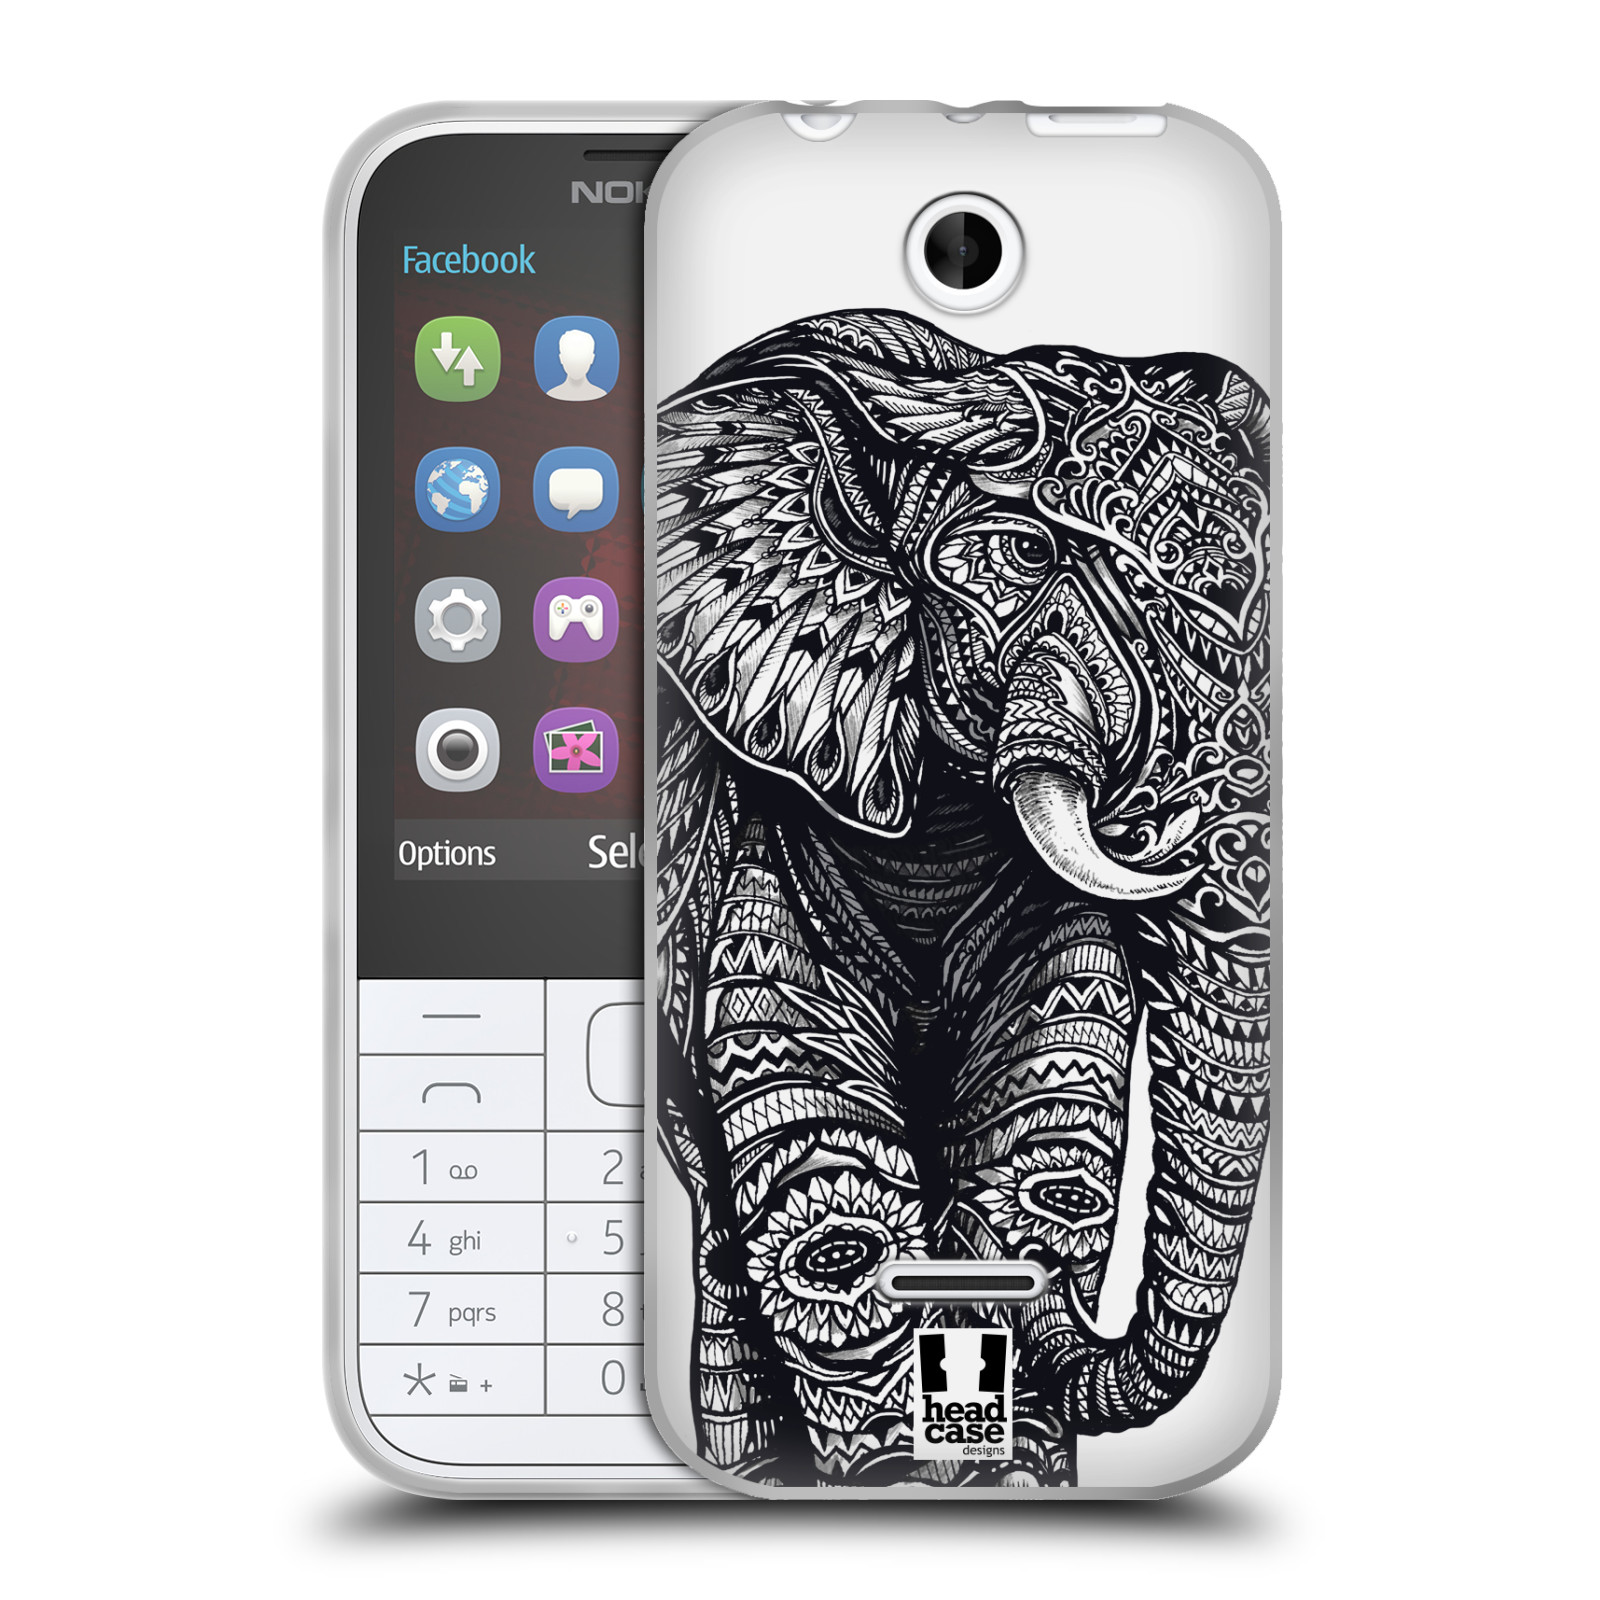 Silikonové pouzdro na mobil Nokia 225 HEAD CASE Zdobený Slon (Silikonový kryt či obal na mobilní telefon Nokia 225)